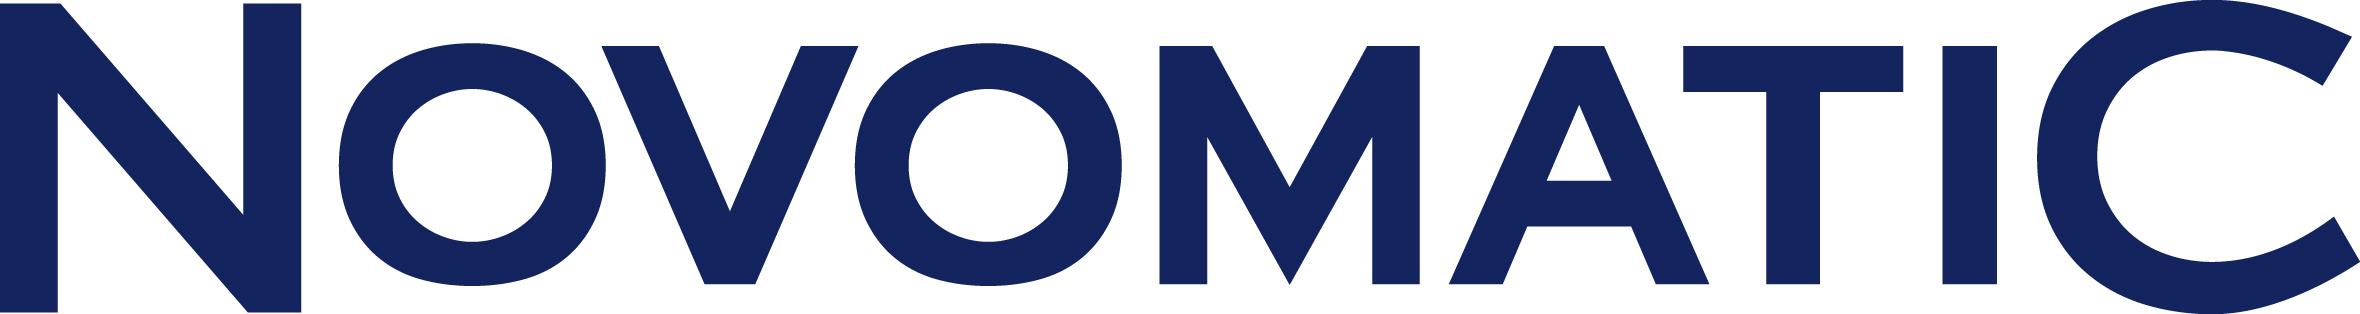 Novomatic: Bilanz leidet unter Regulierungsdruck